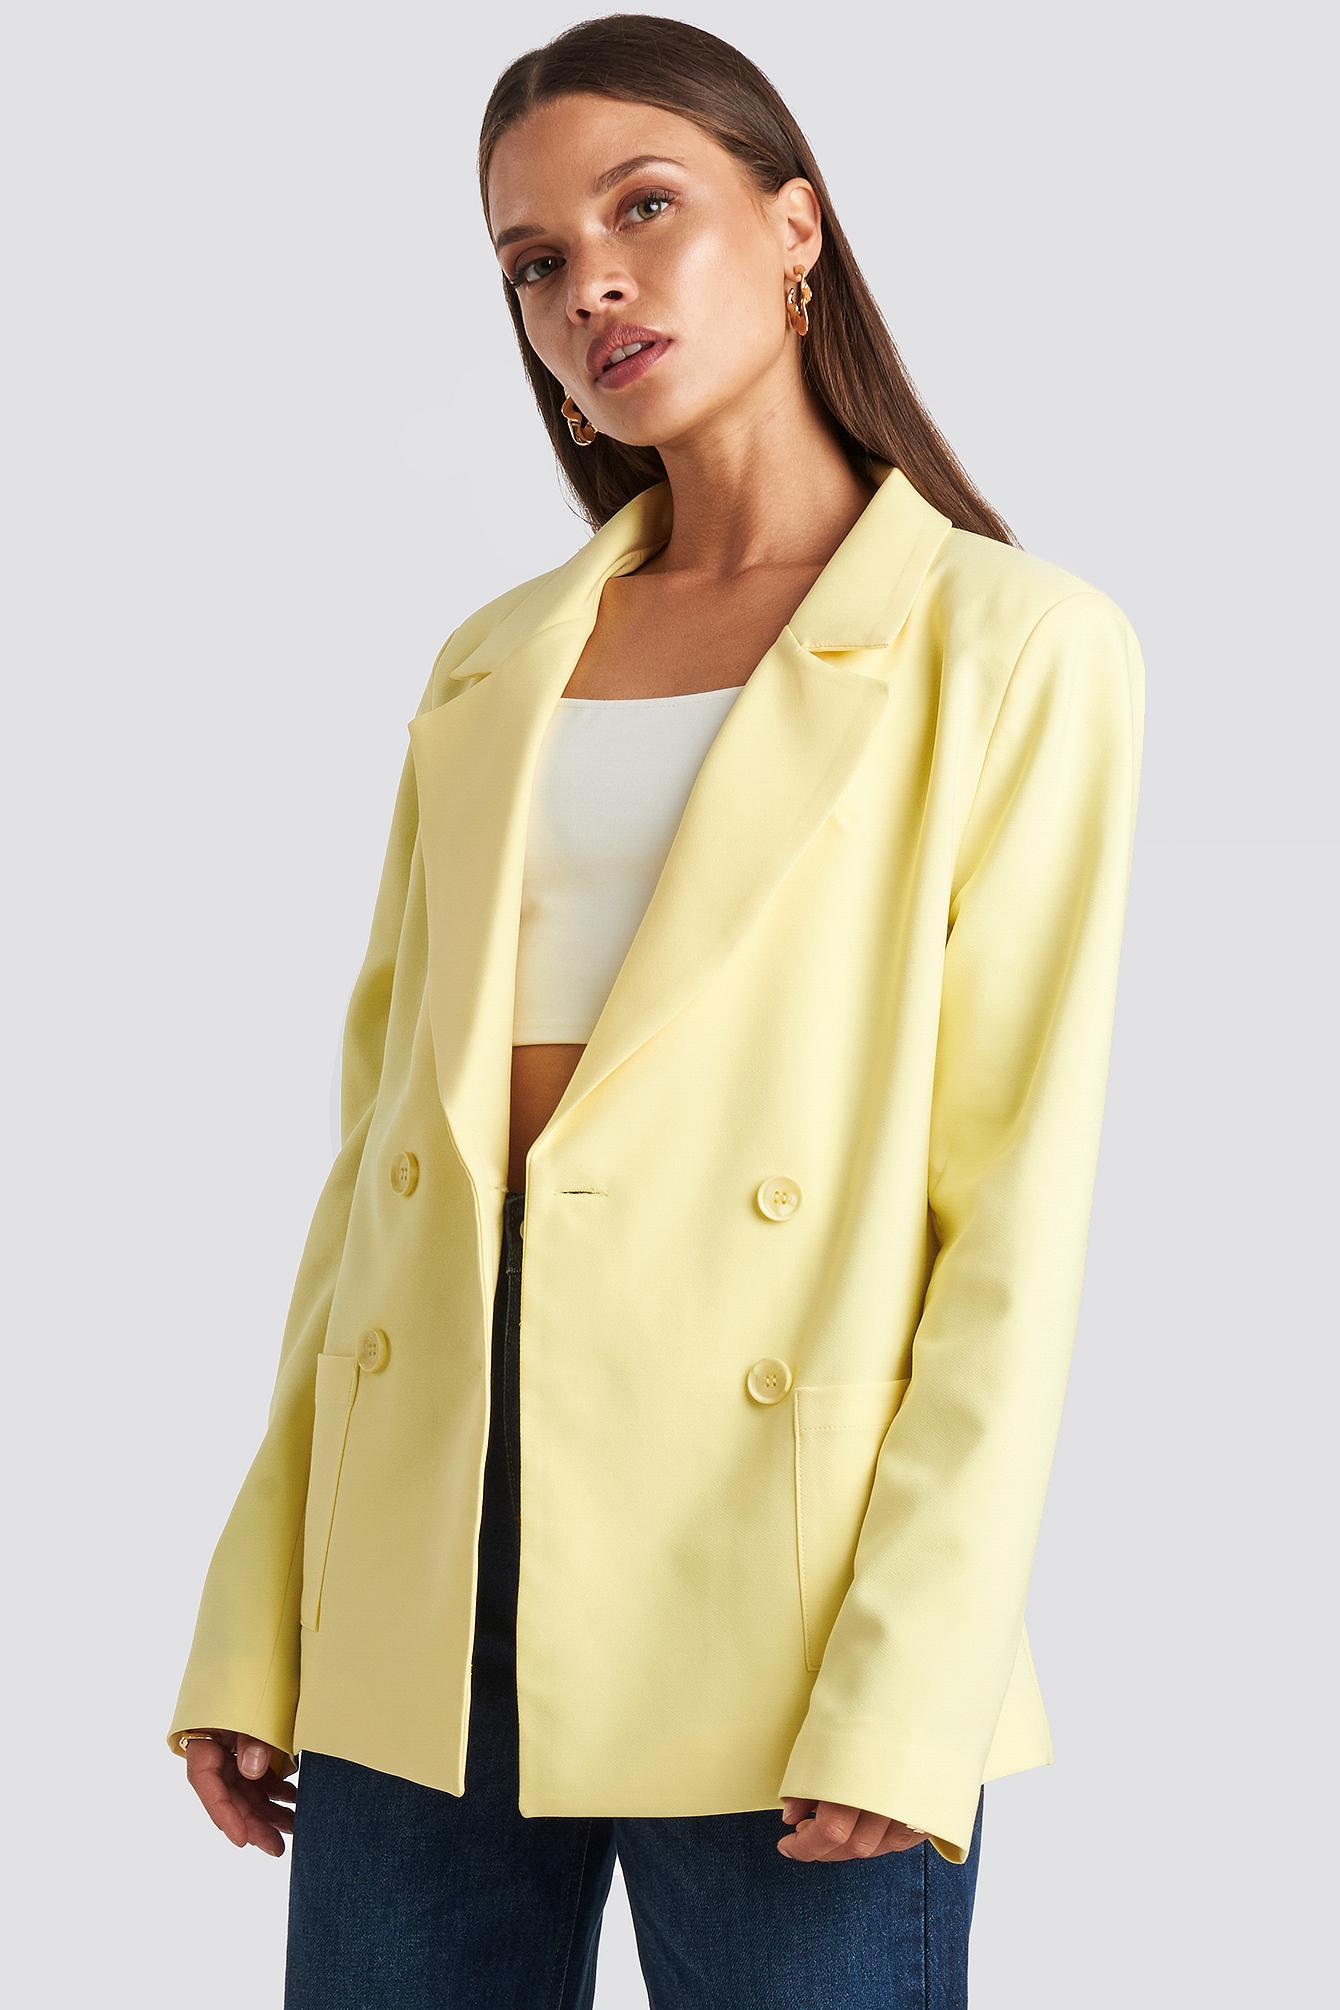 emilie briting x na-kd -  Front Pocket Oversized Blazer - Yellow